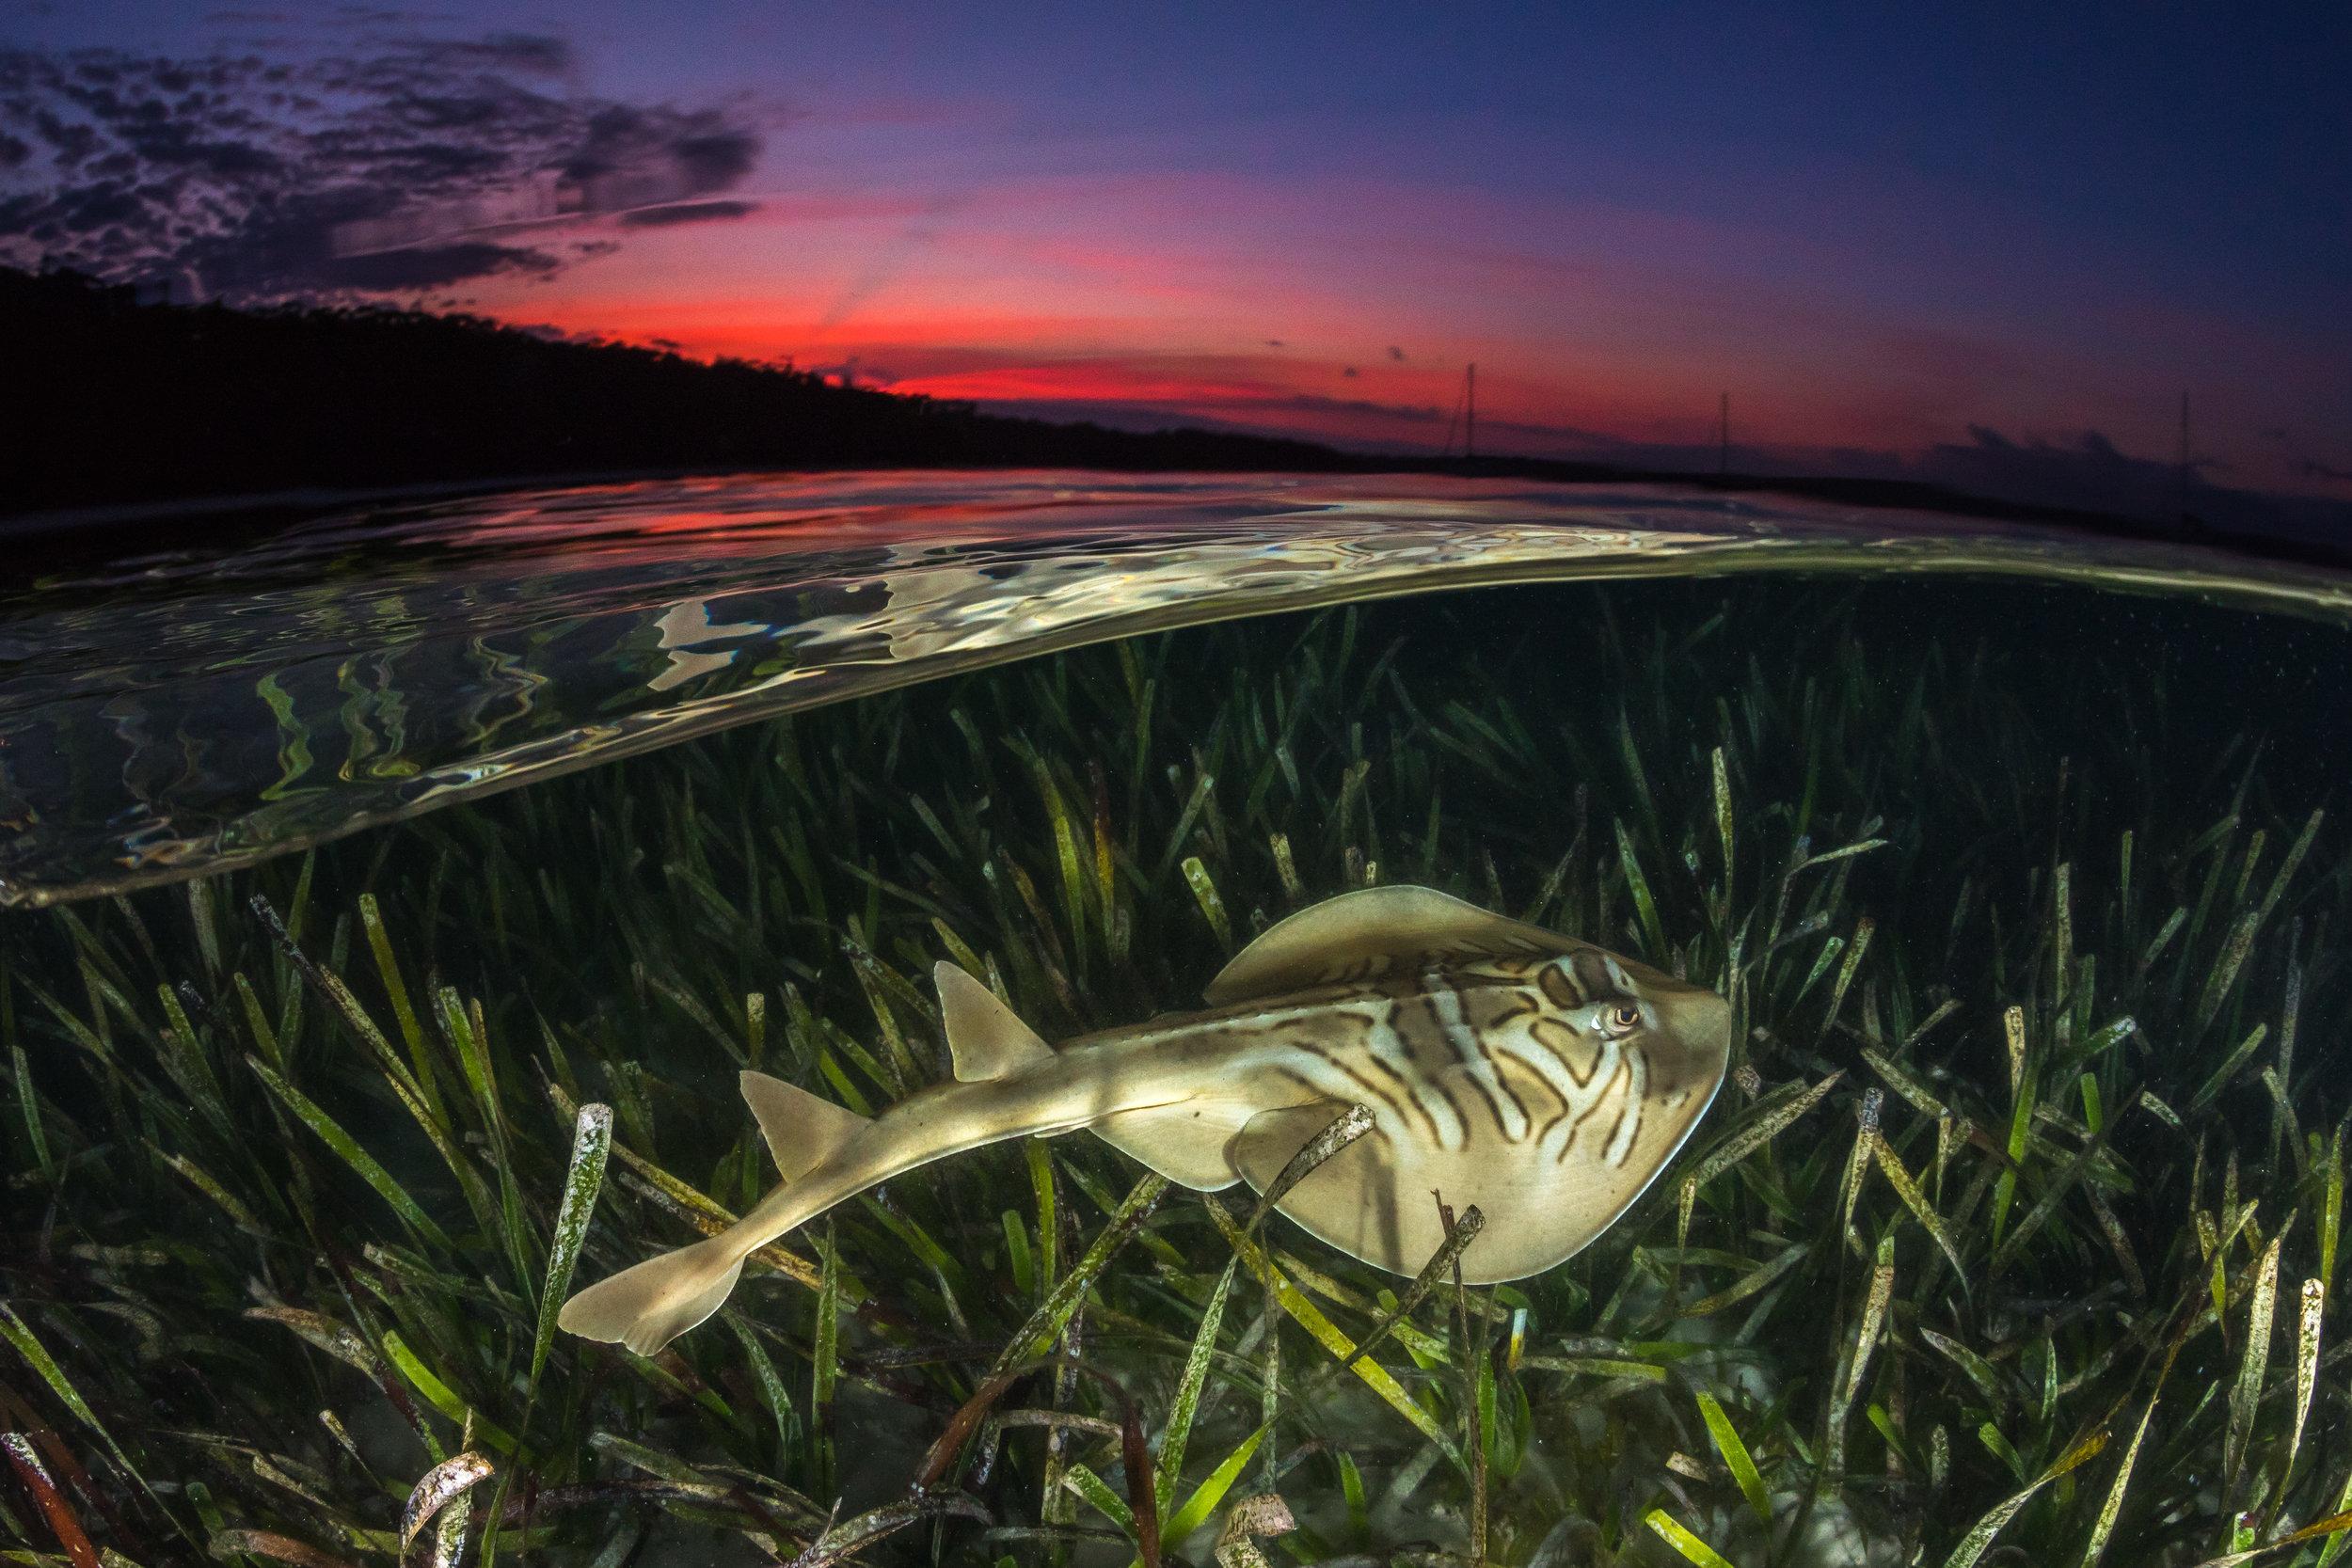 Eastern Fiddlar Ray credit: JORDAN ROBINS / coral reef image bank